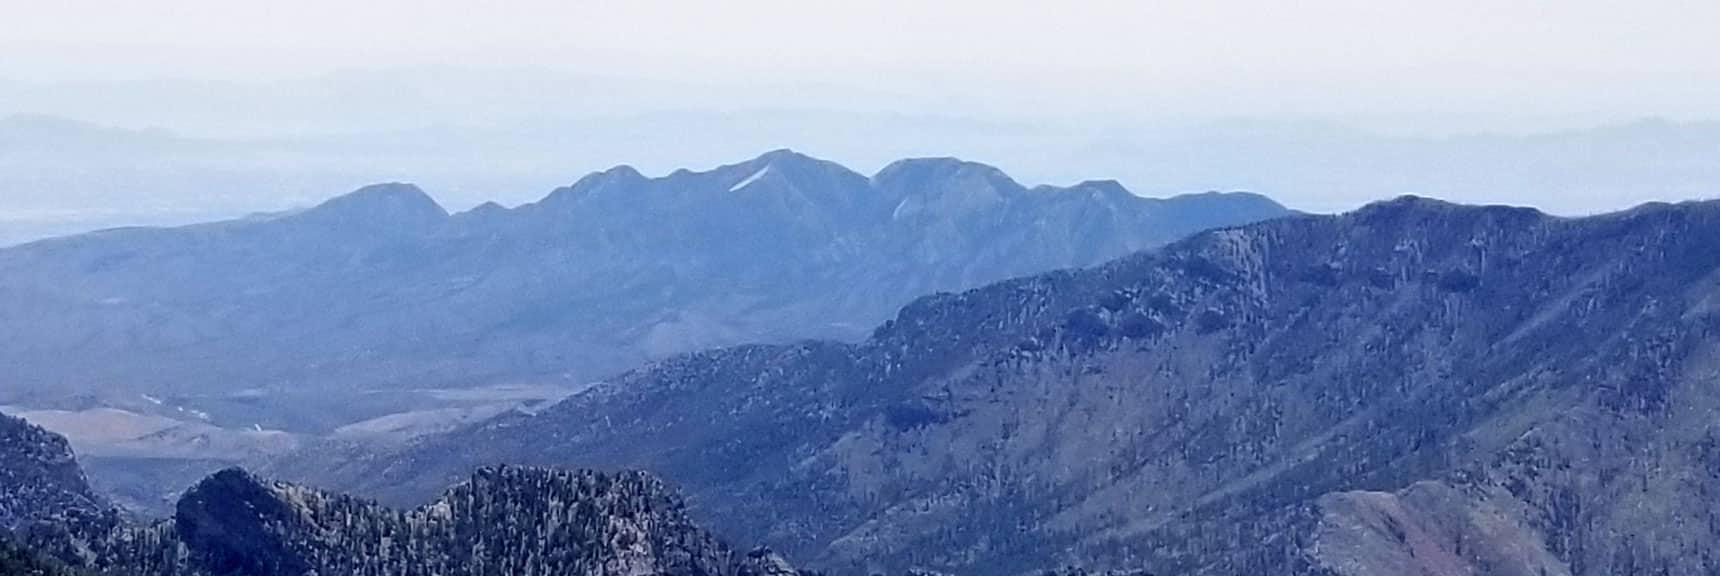 La Madre Mt. Viewed from Lee Peak Summit in Mt. Charleston Wilderness, Nevada